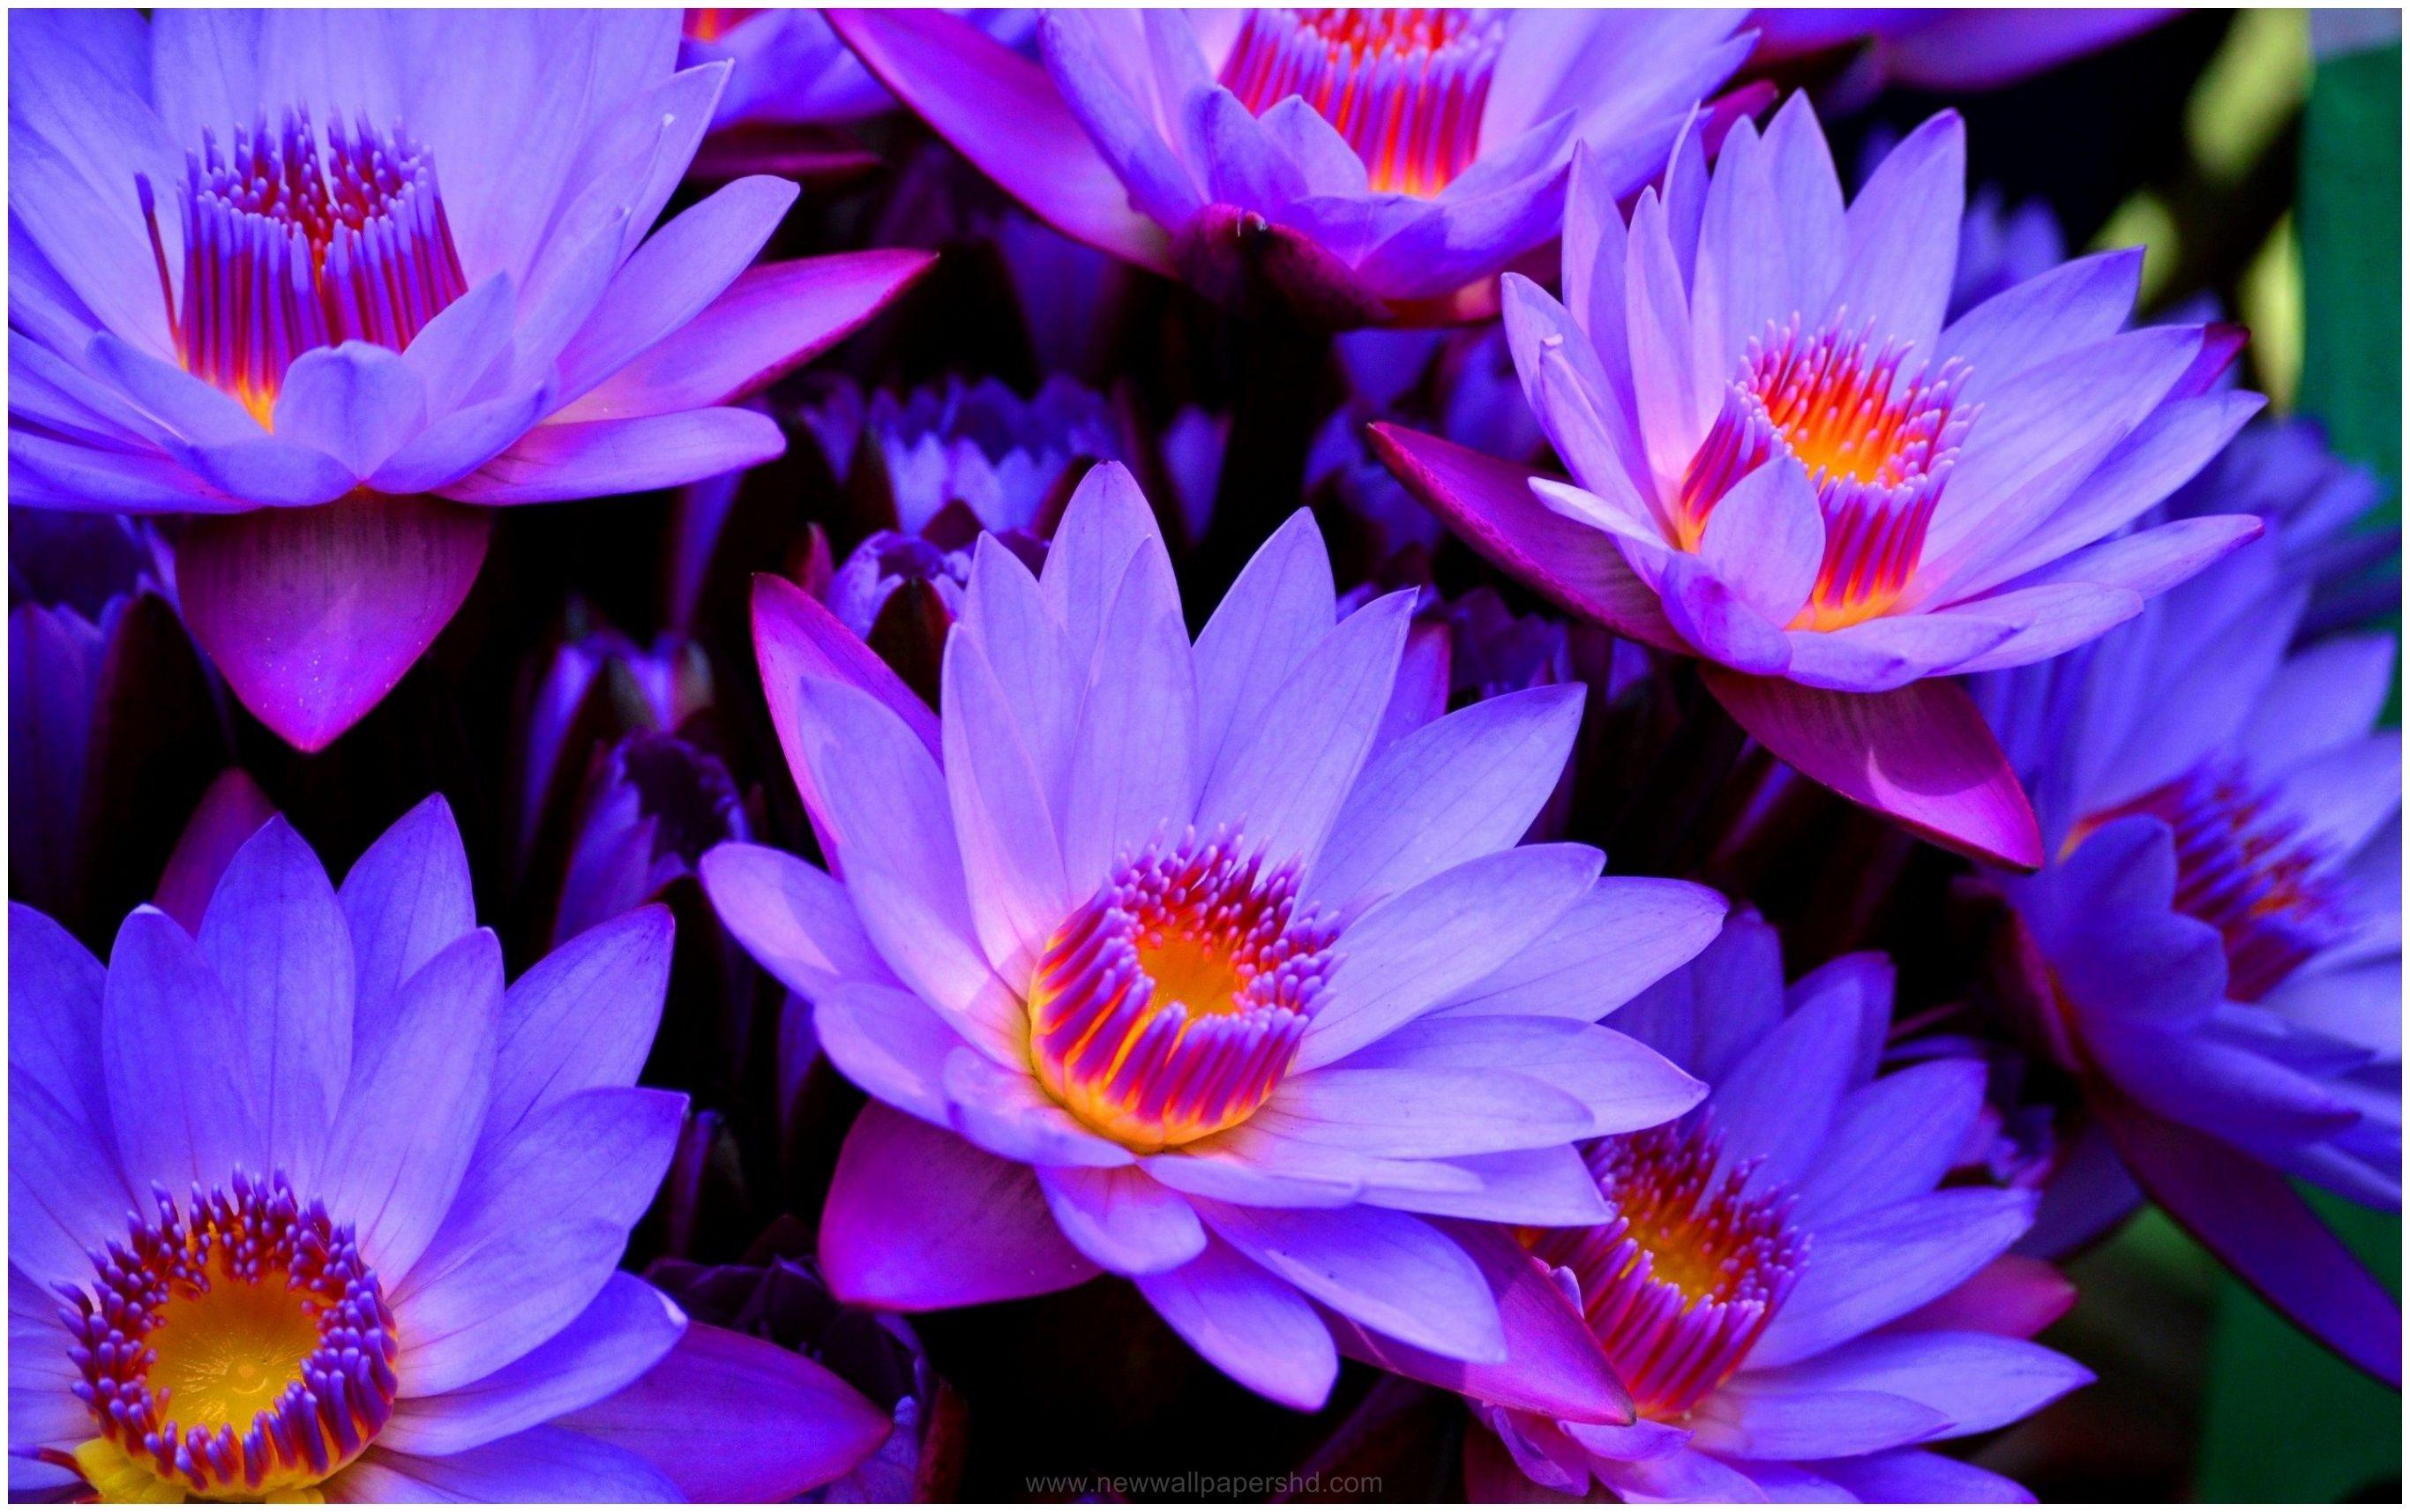 BLUE LOTUS FLOWER HD WALLPAPER Wallpapers Pinterest